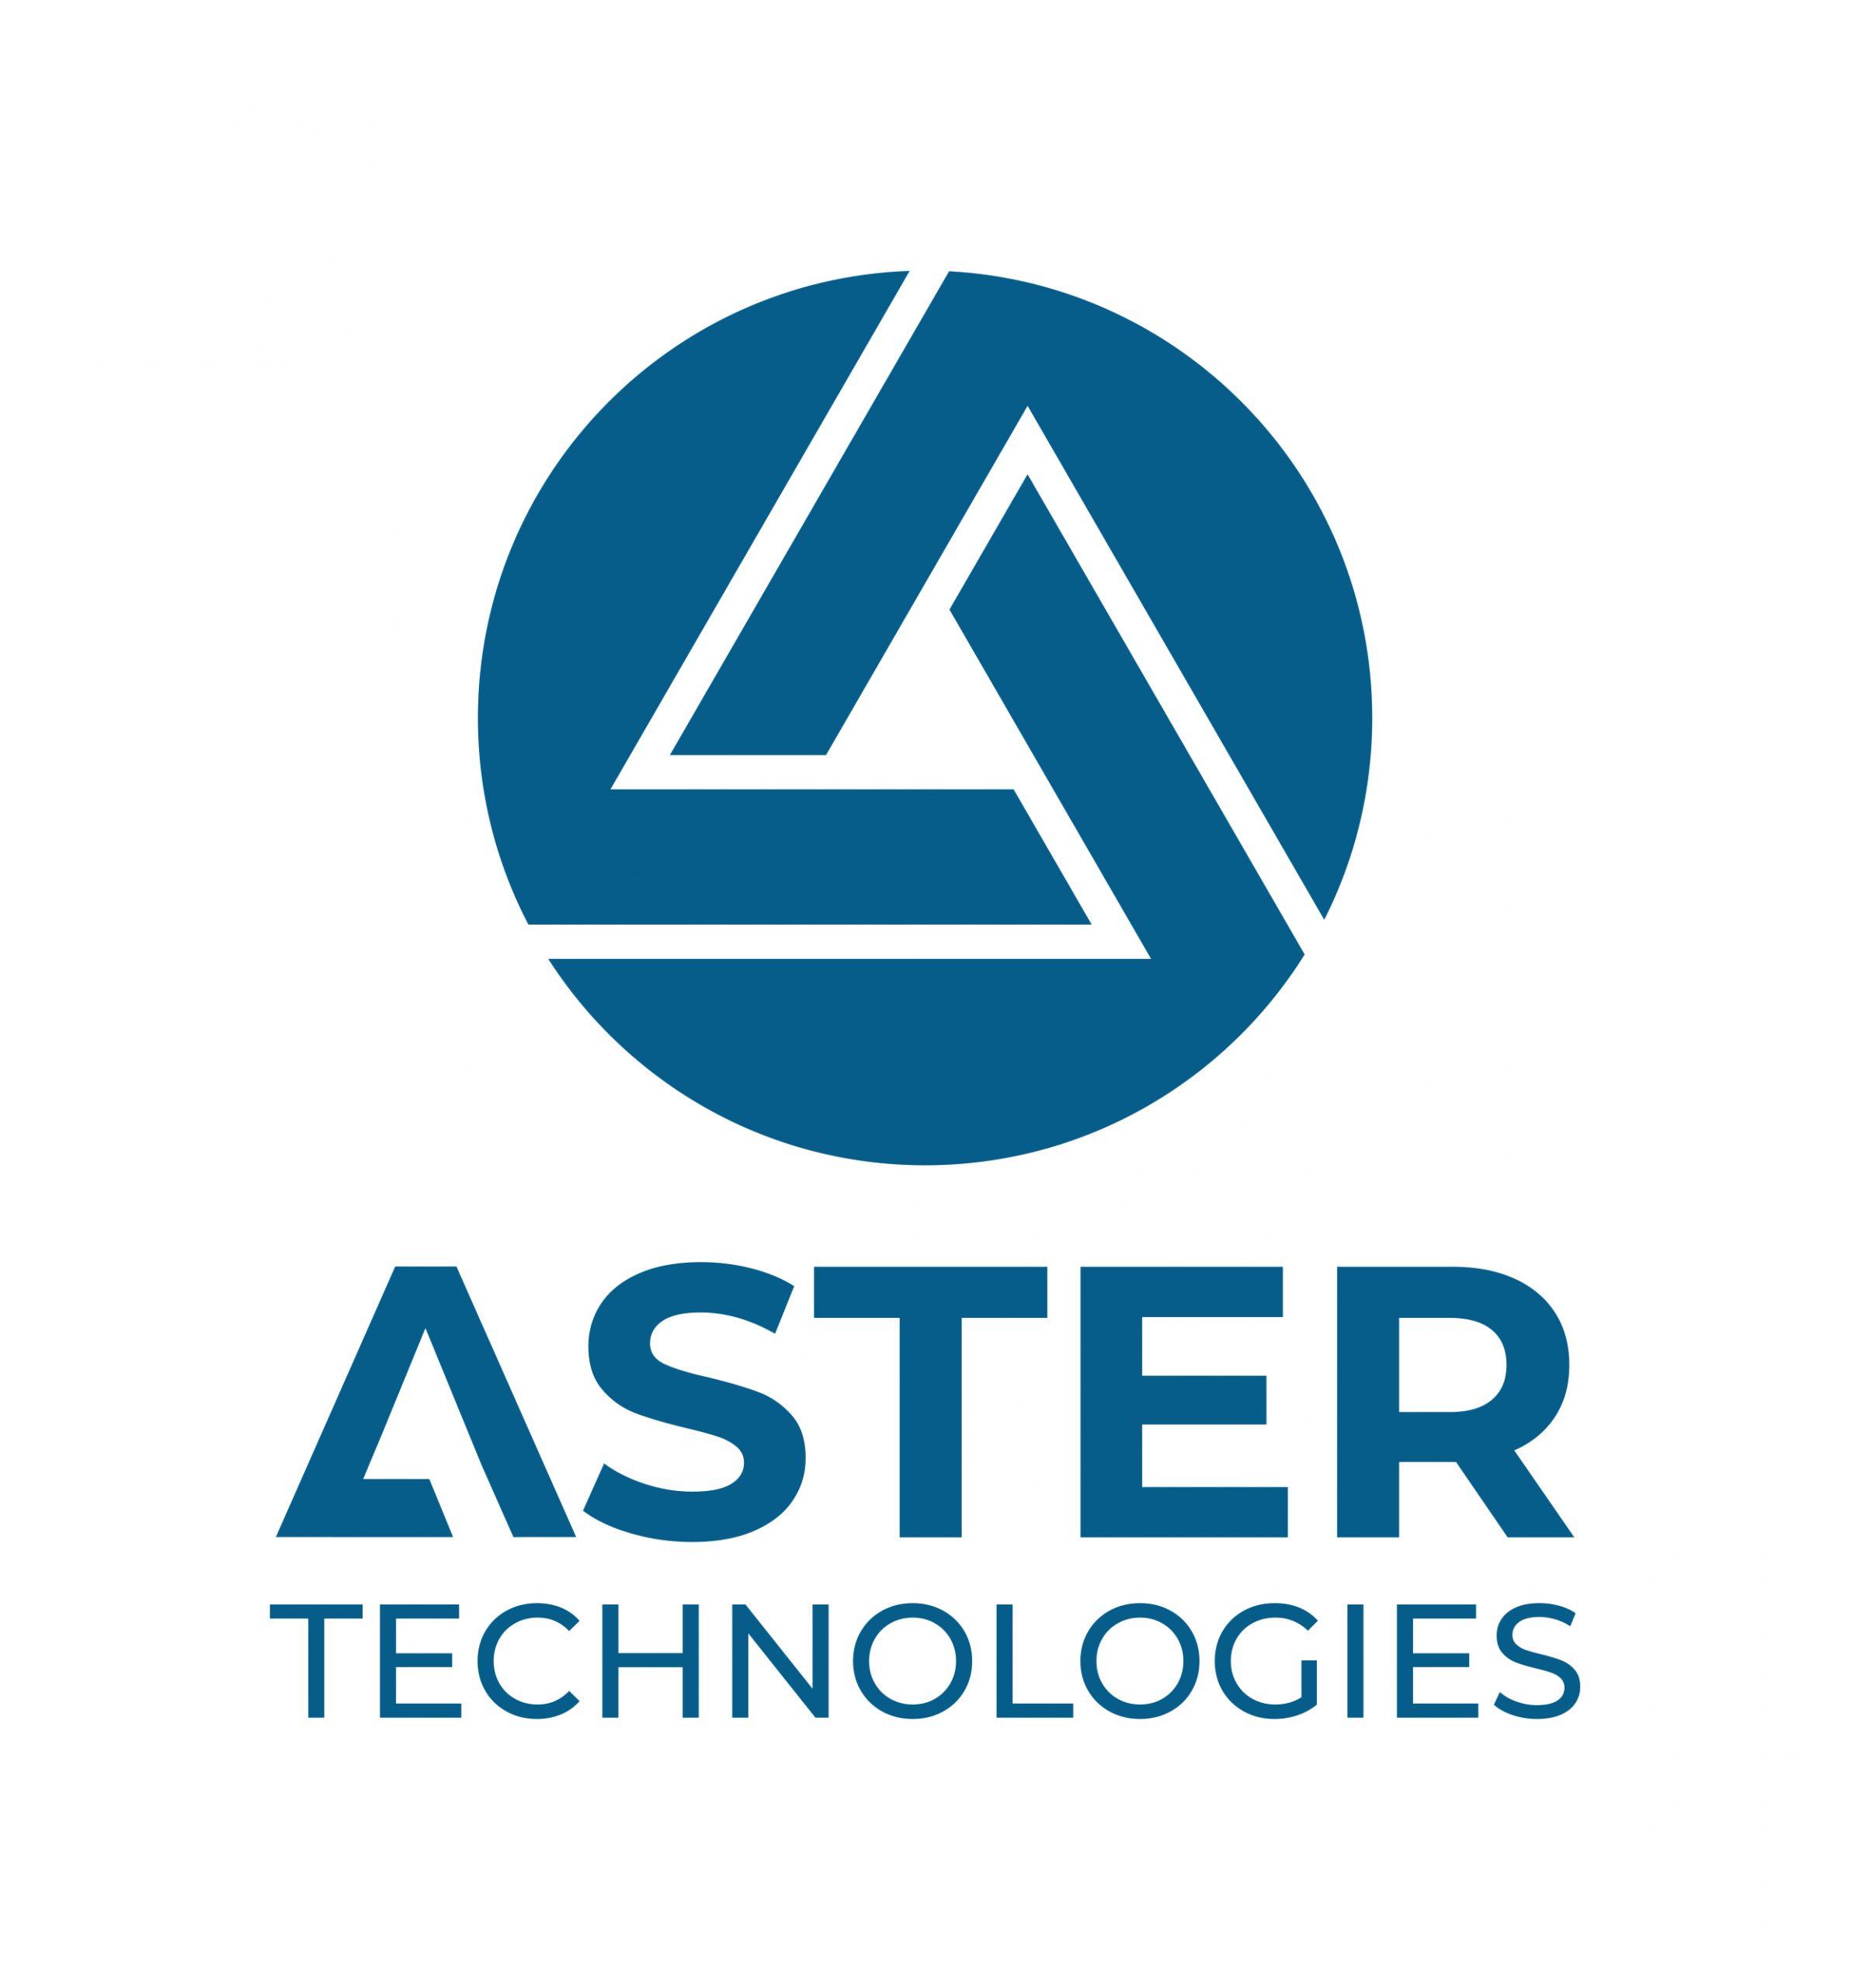 ASTER TECHNOLOGIES